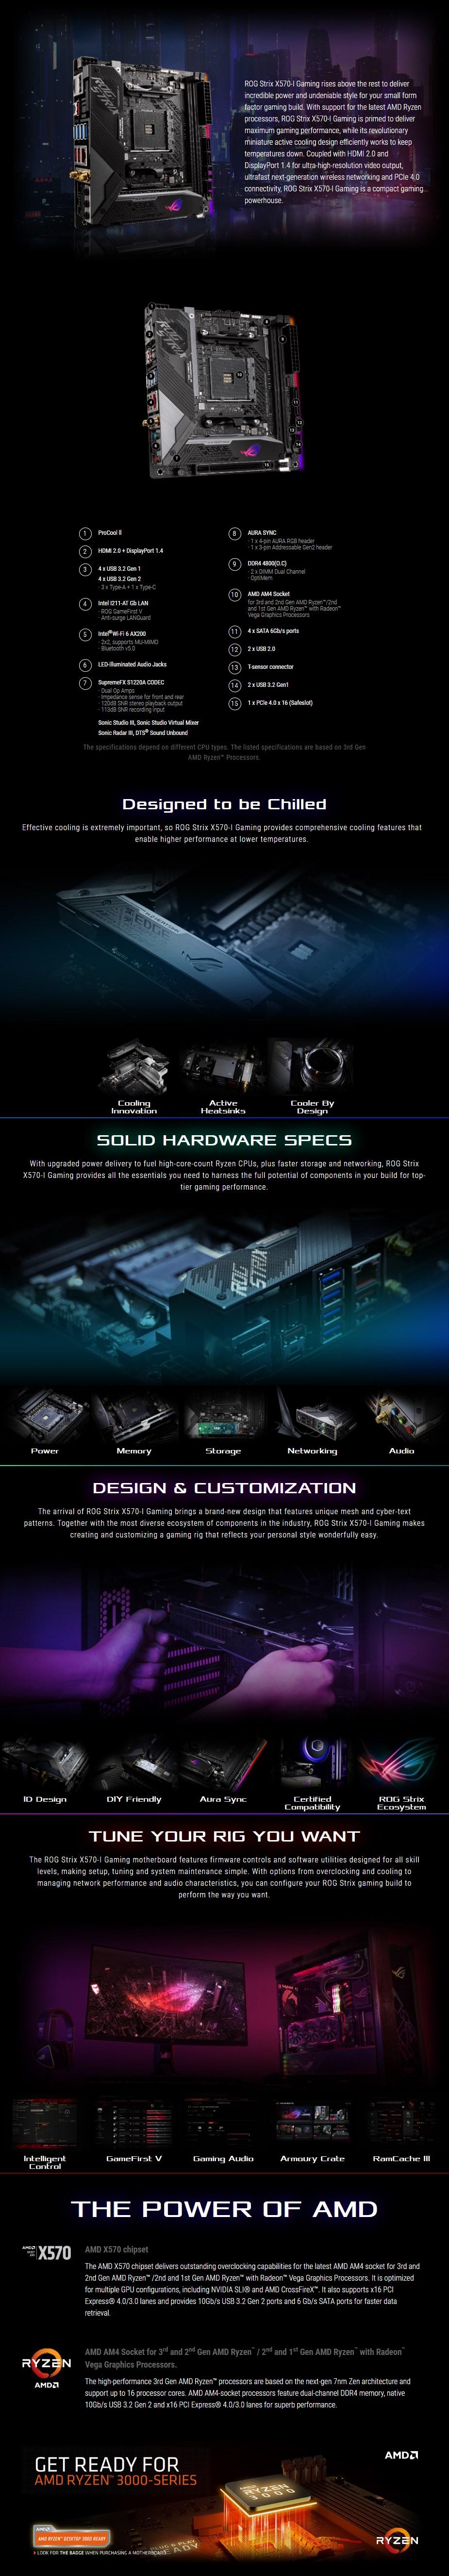 asus-rog-strafx-x570i-gaming-am4-miniitx-motherboard-ac24583-8.jpg